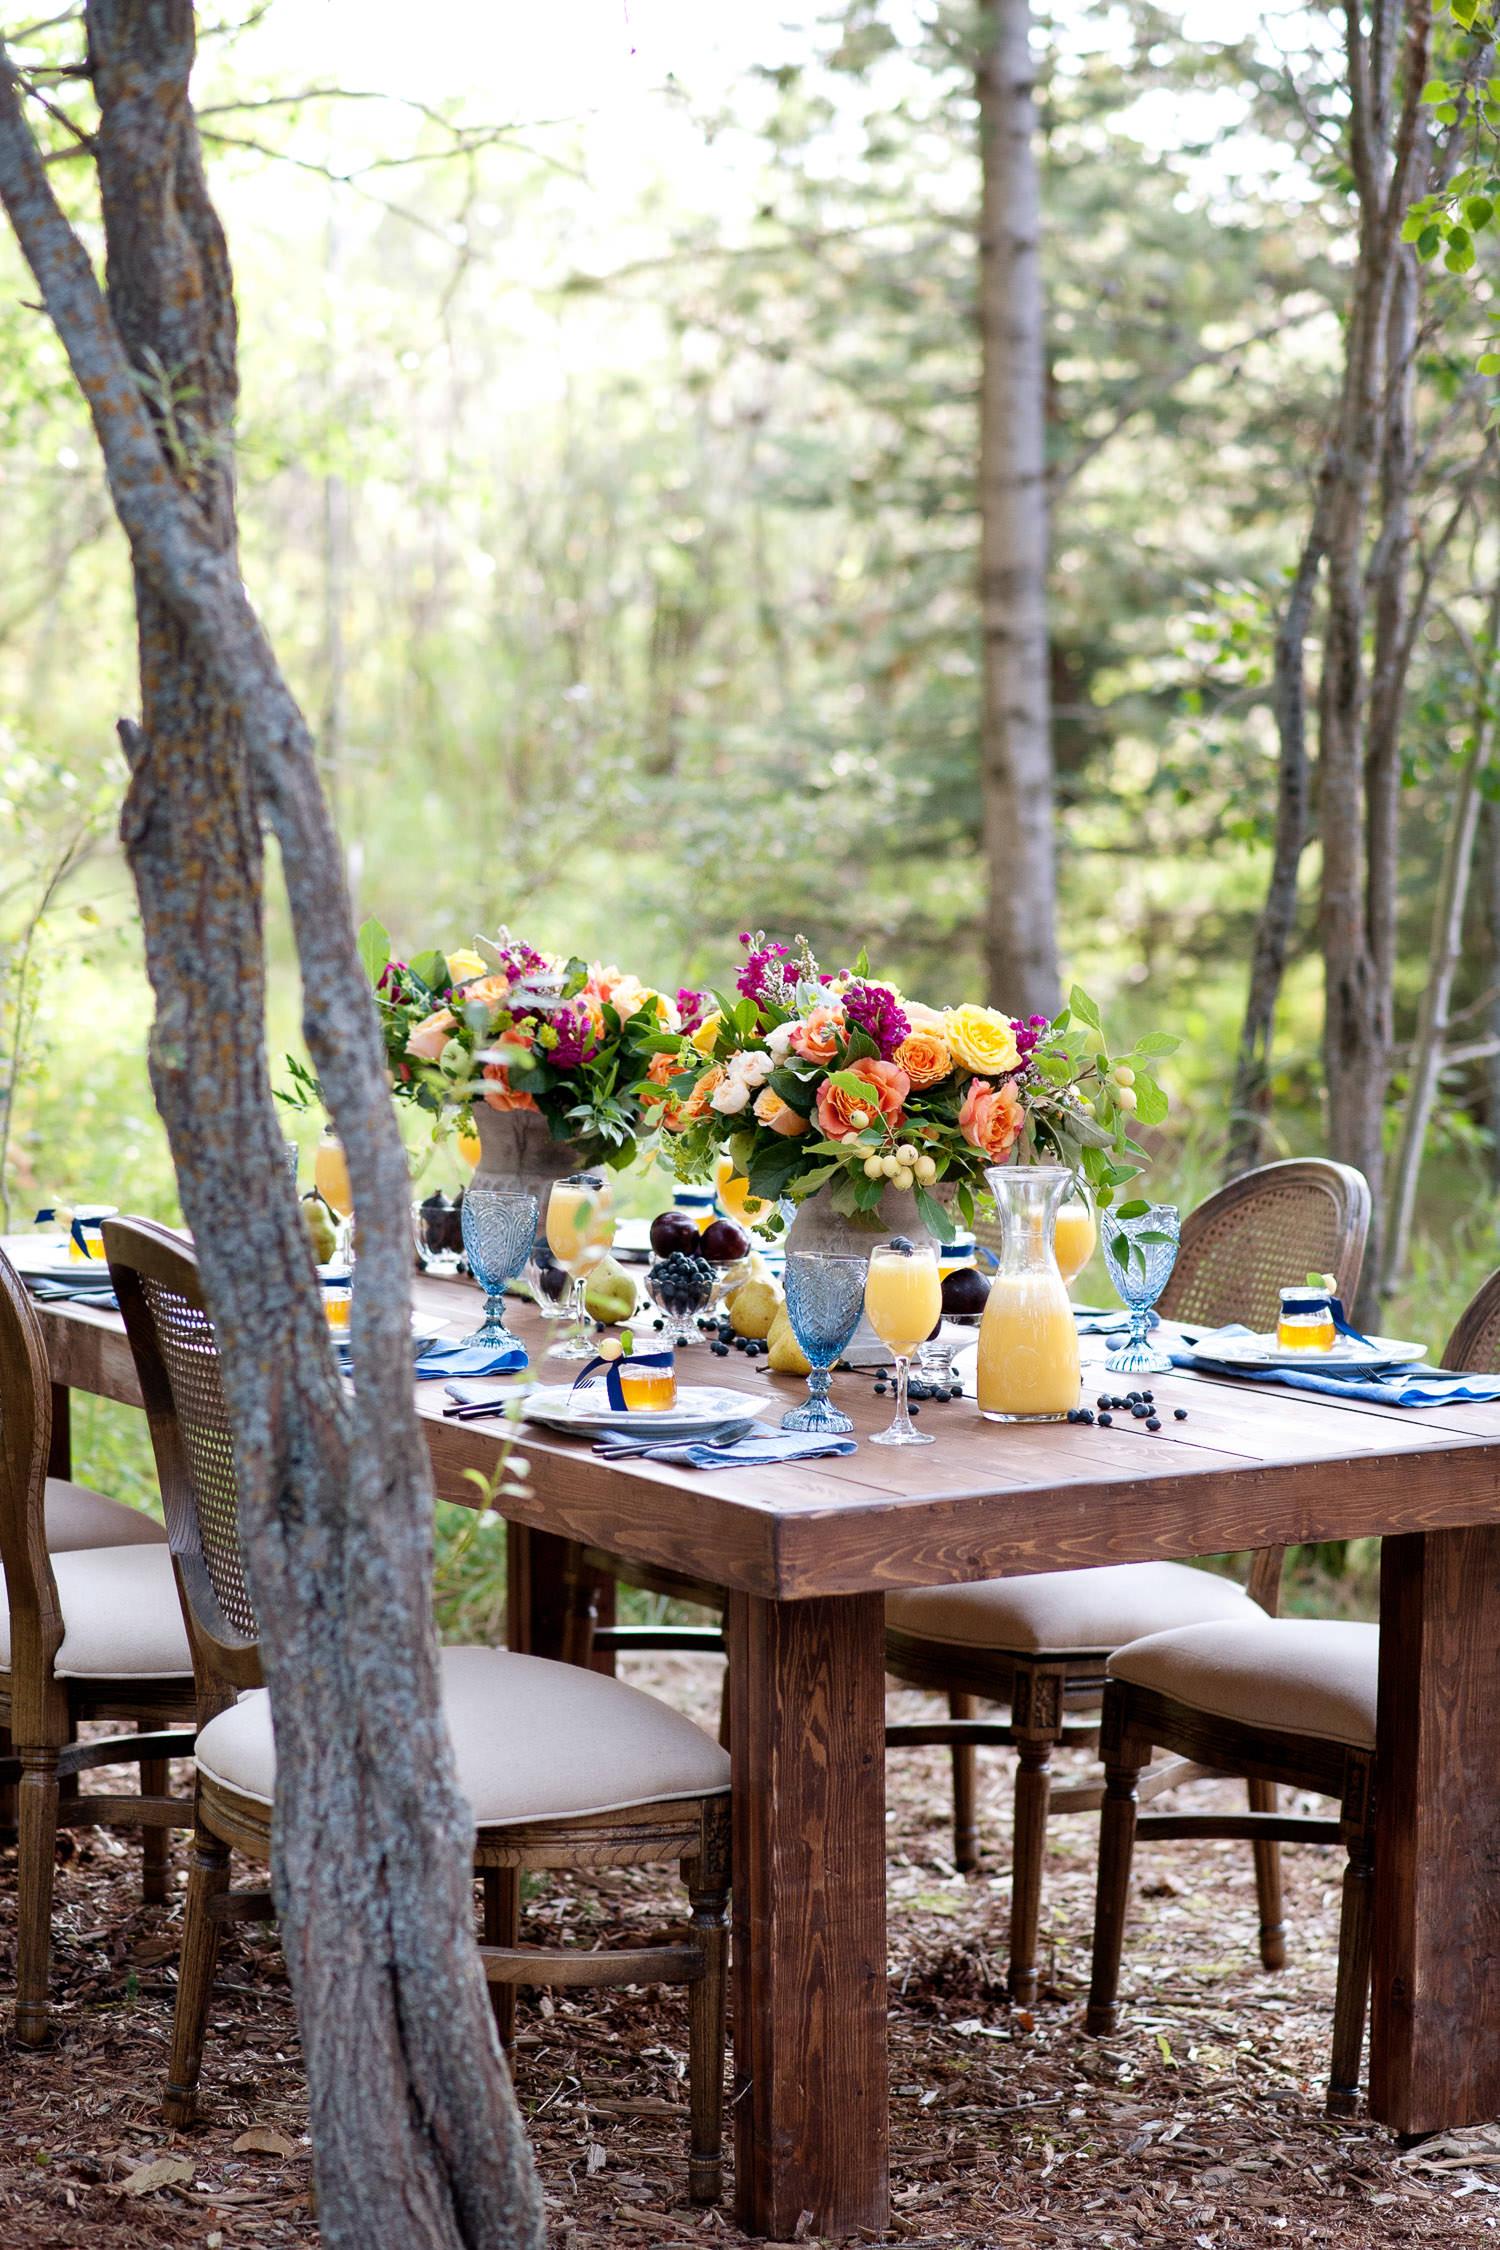 al fresco brunch wedding table captured by Tara Whittaker Photography